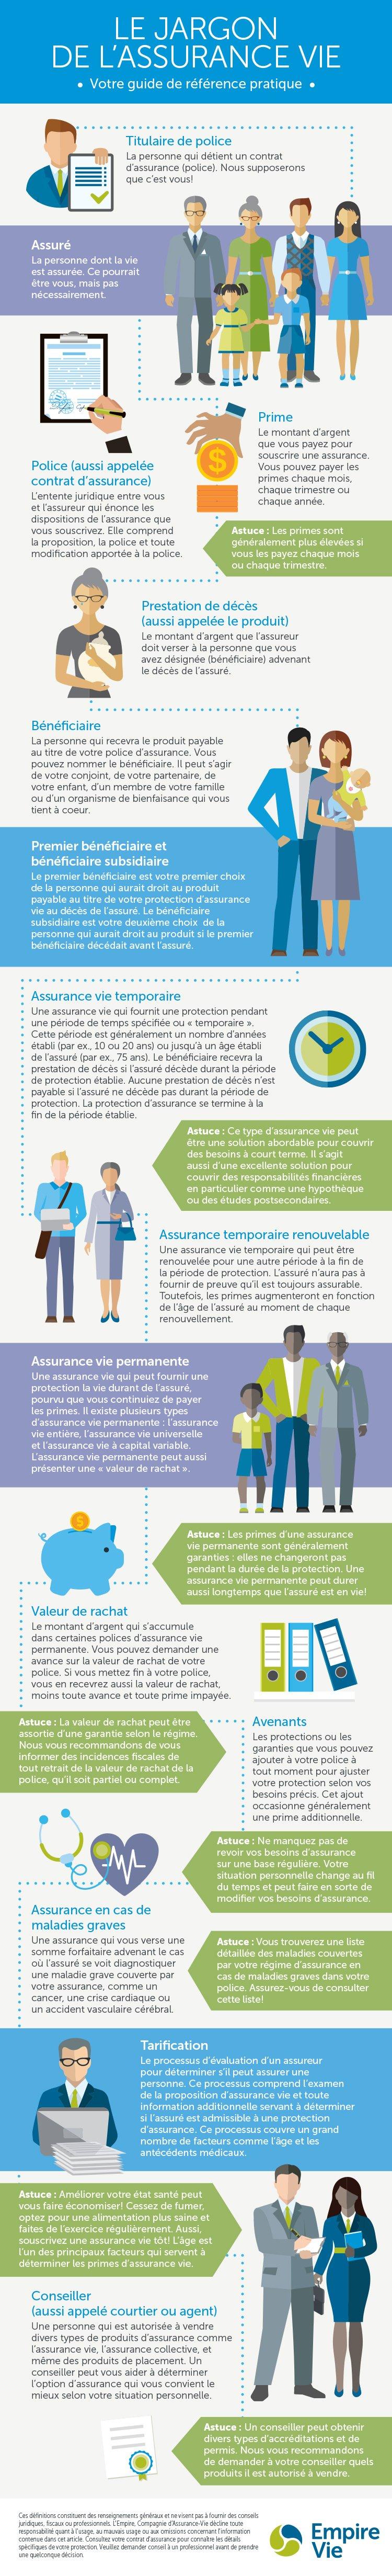 InsuranceLingo-Infographic-FR